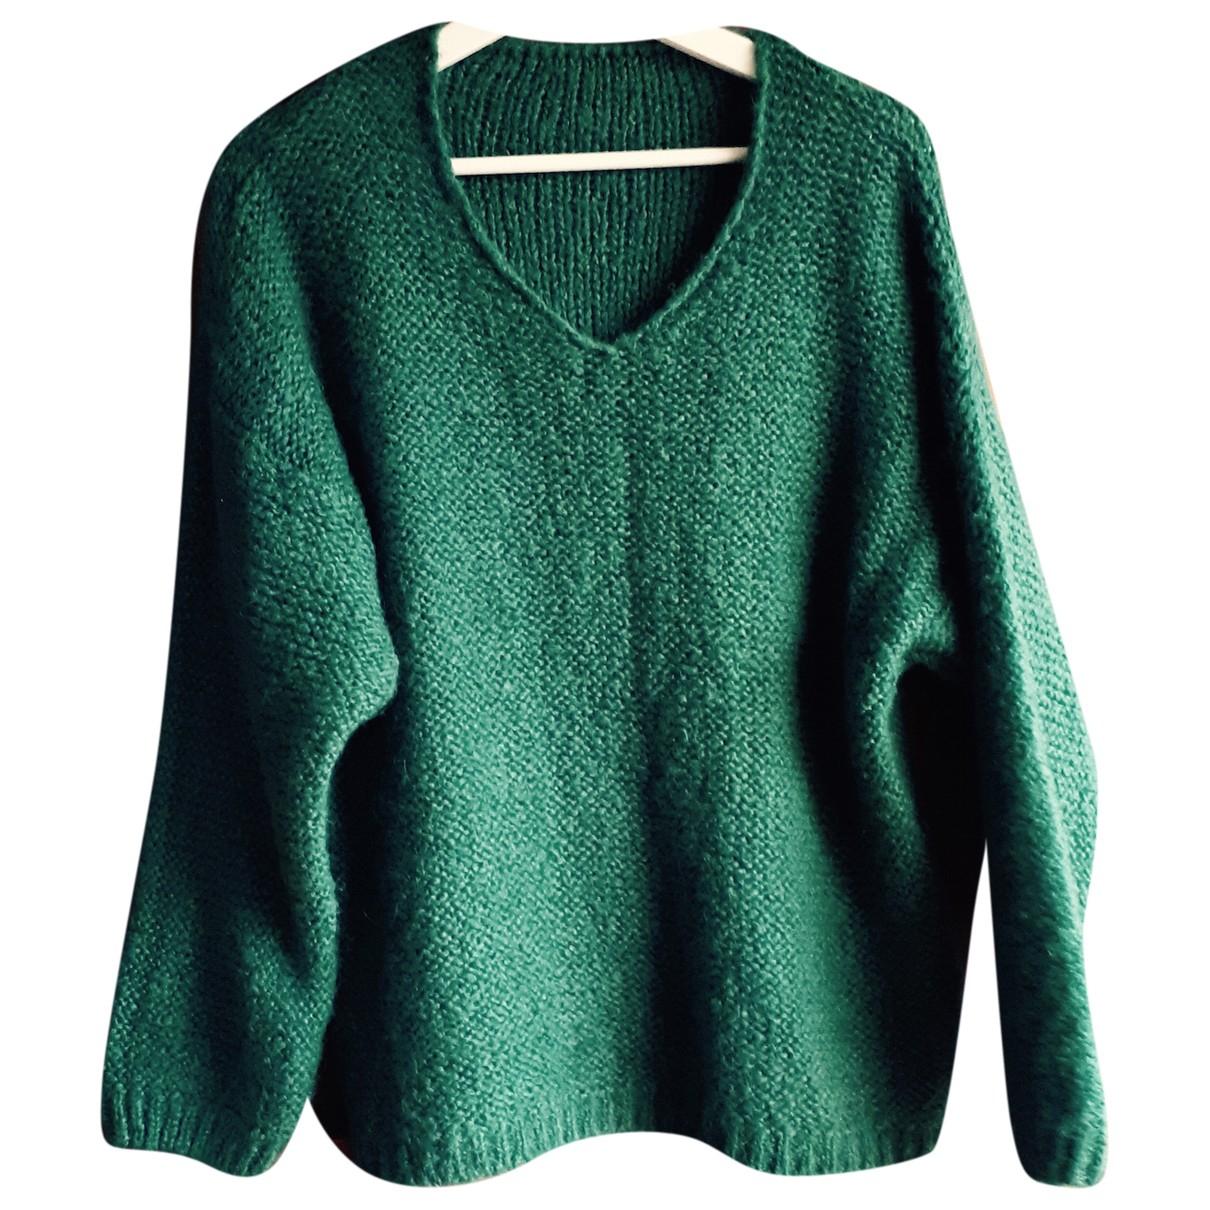 Autre Marque N Green Wool Knitwear for Women One Size International